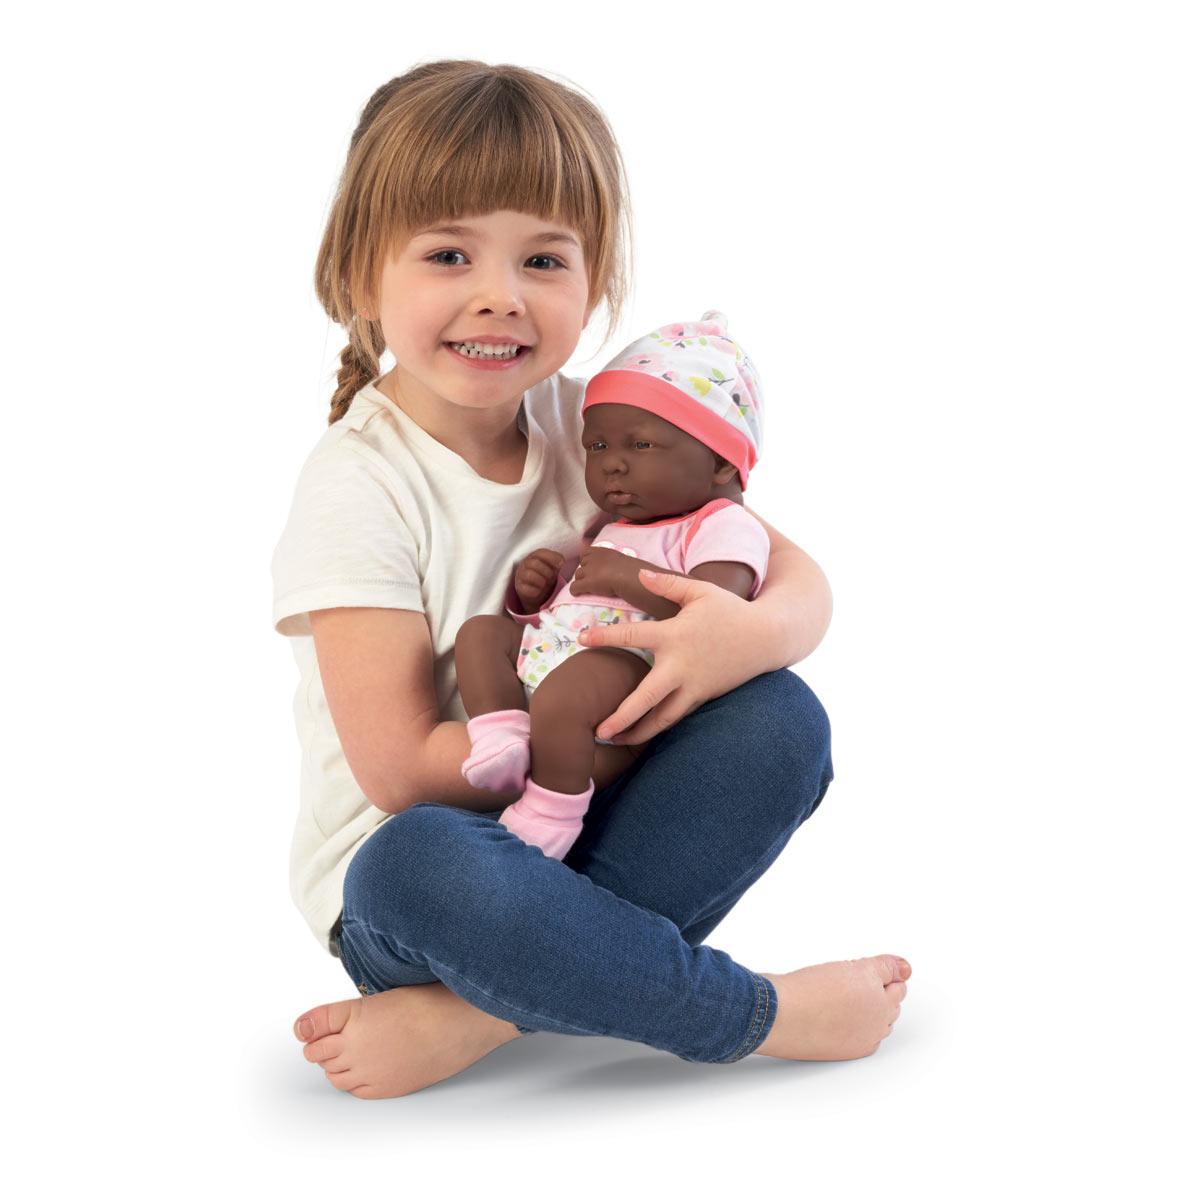 Cupcake Newborn Baby Girl Doll